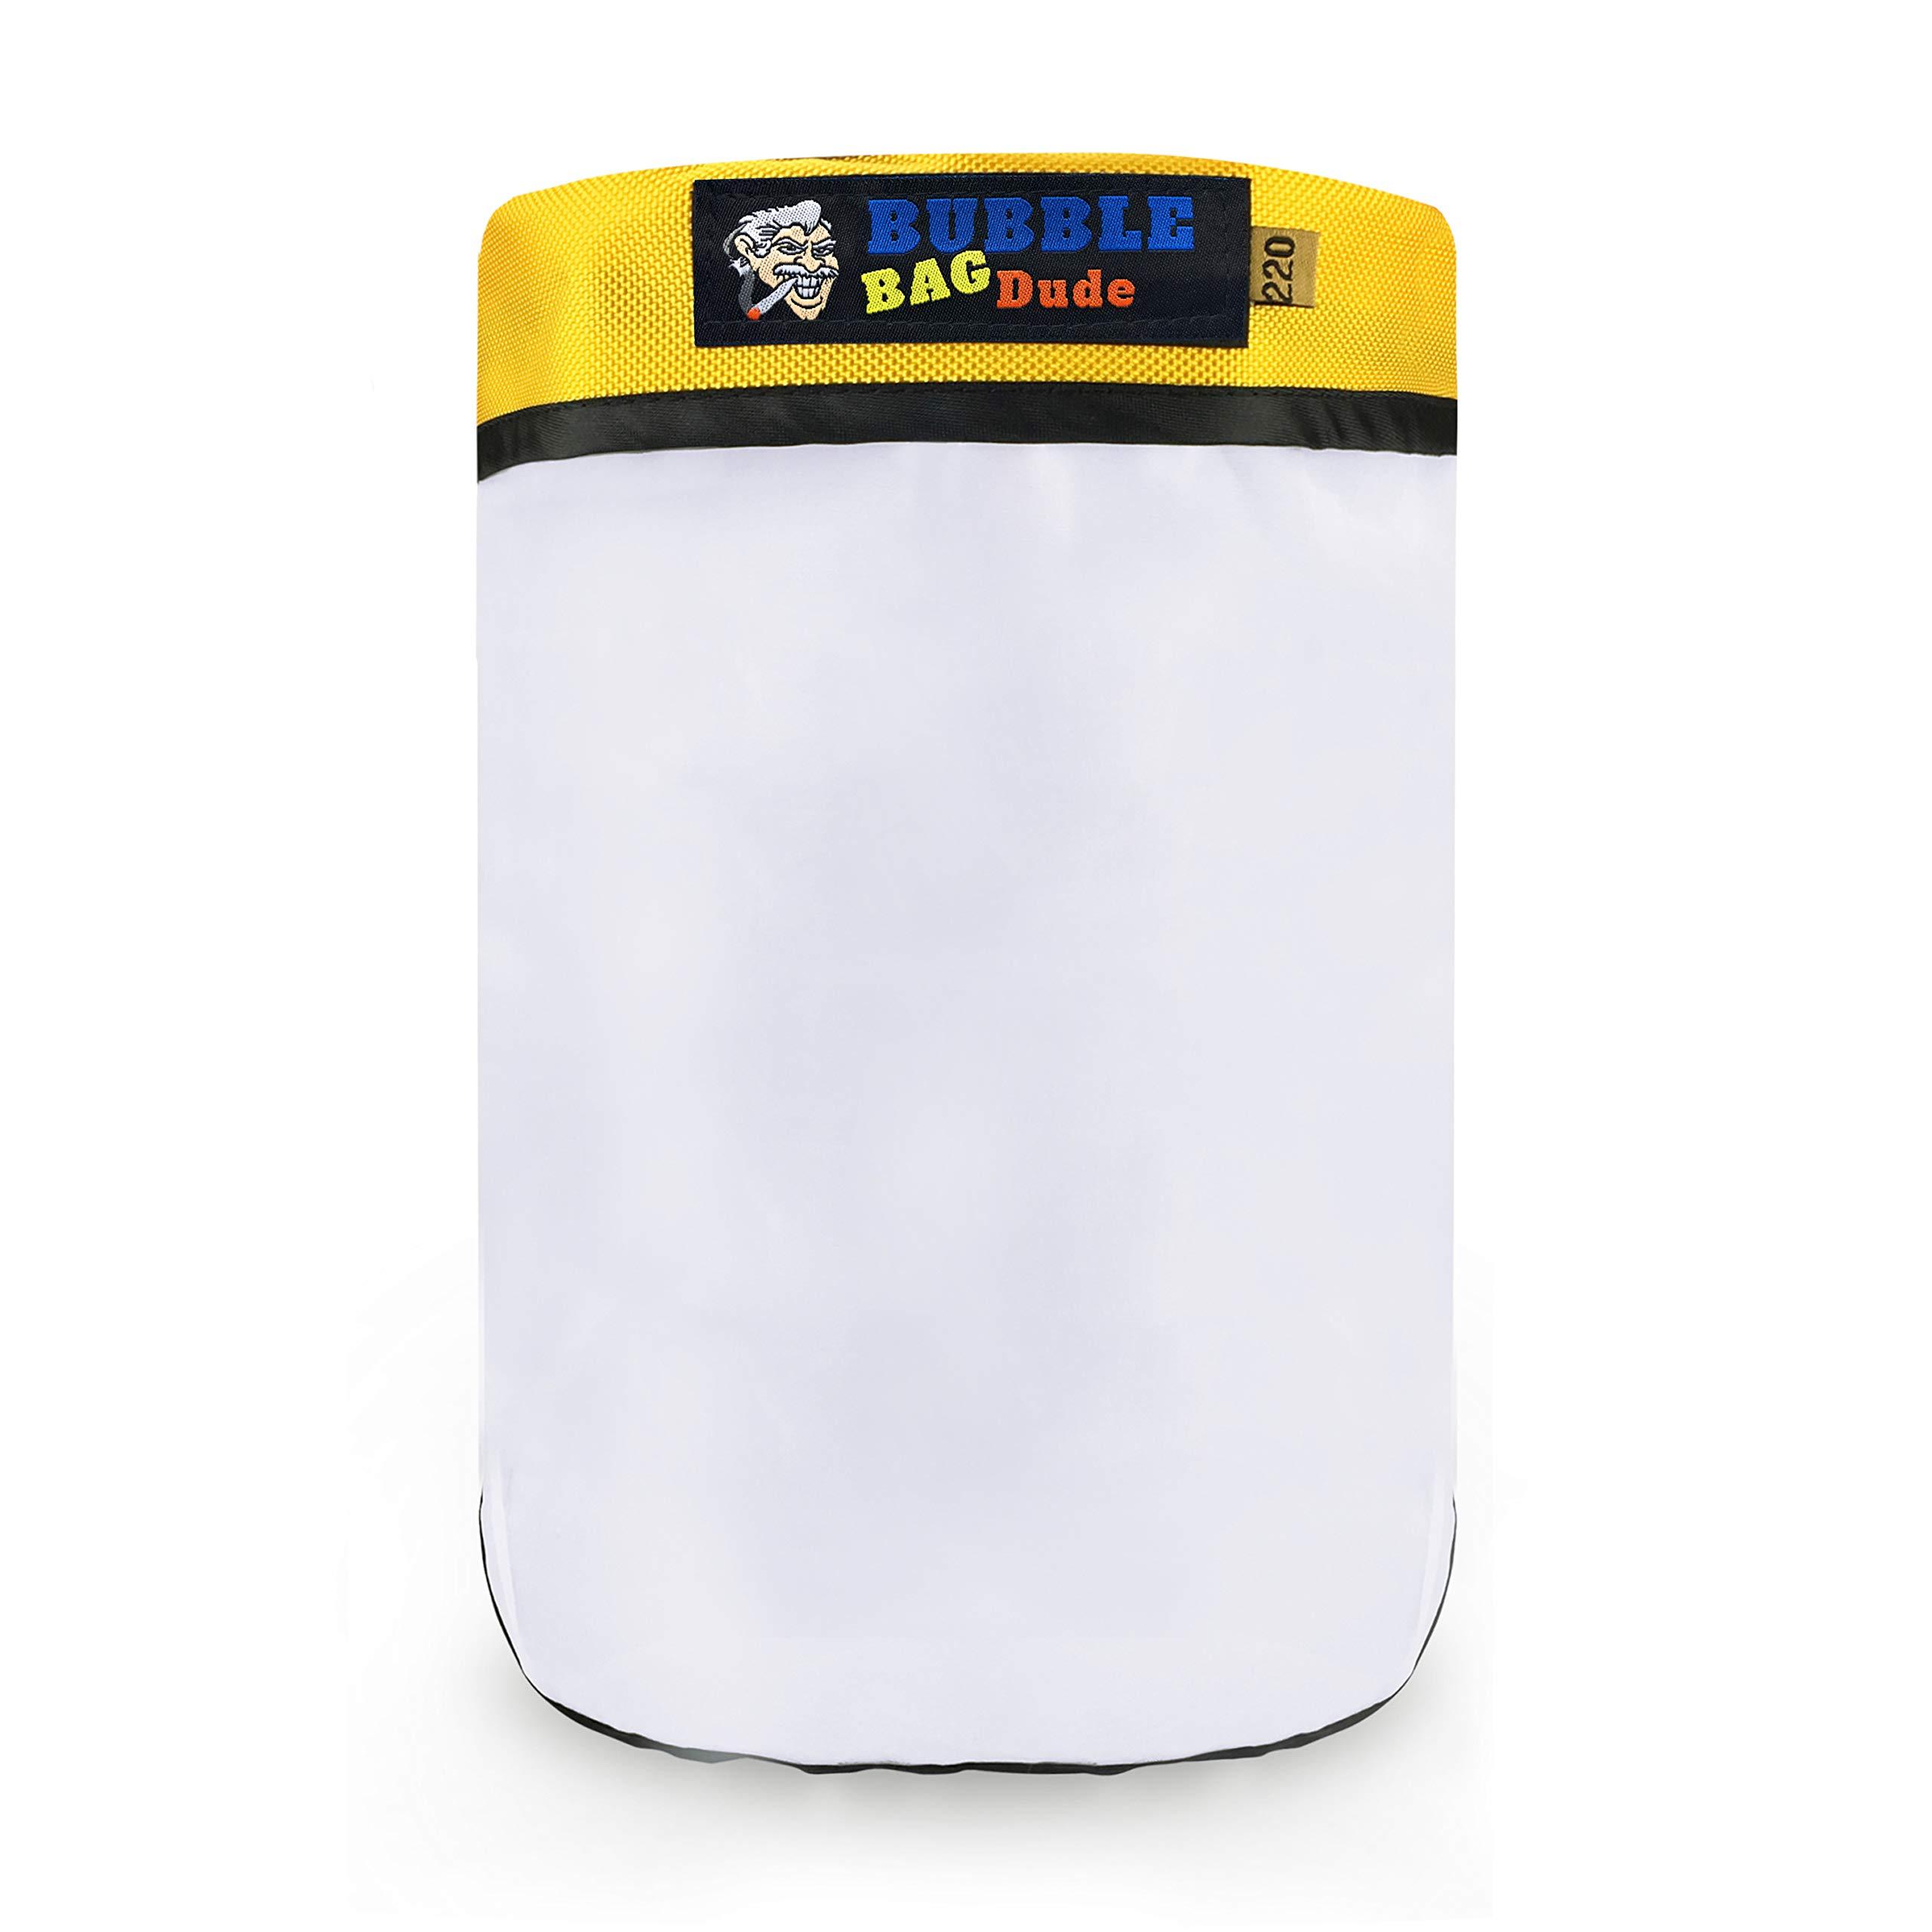 BUBBLEBAGDUDE Bubble Bags 5 Gallon 220 Micron Zipper Bag for 5 Gallon Bubble Machine Herbal Ice Essence Extraction Bag - Reusable Wash Bag